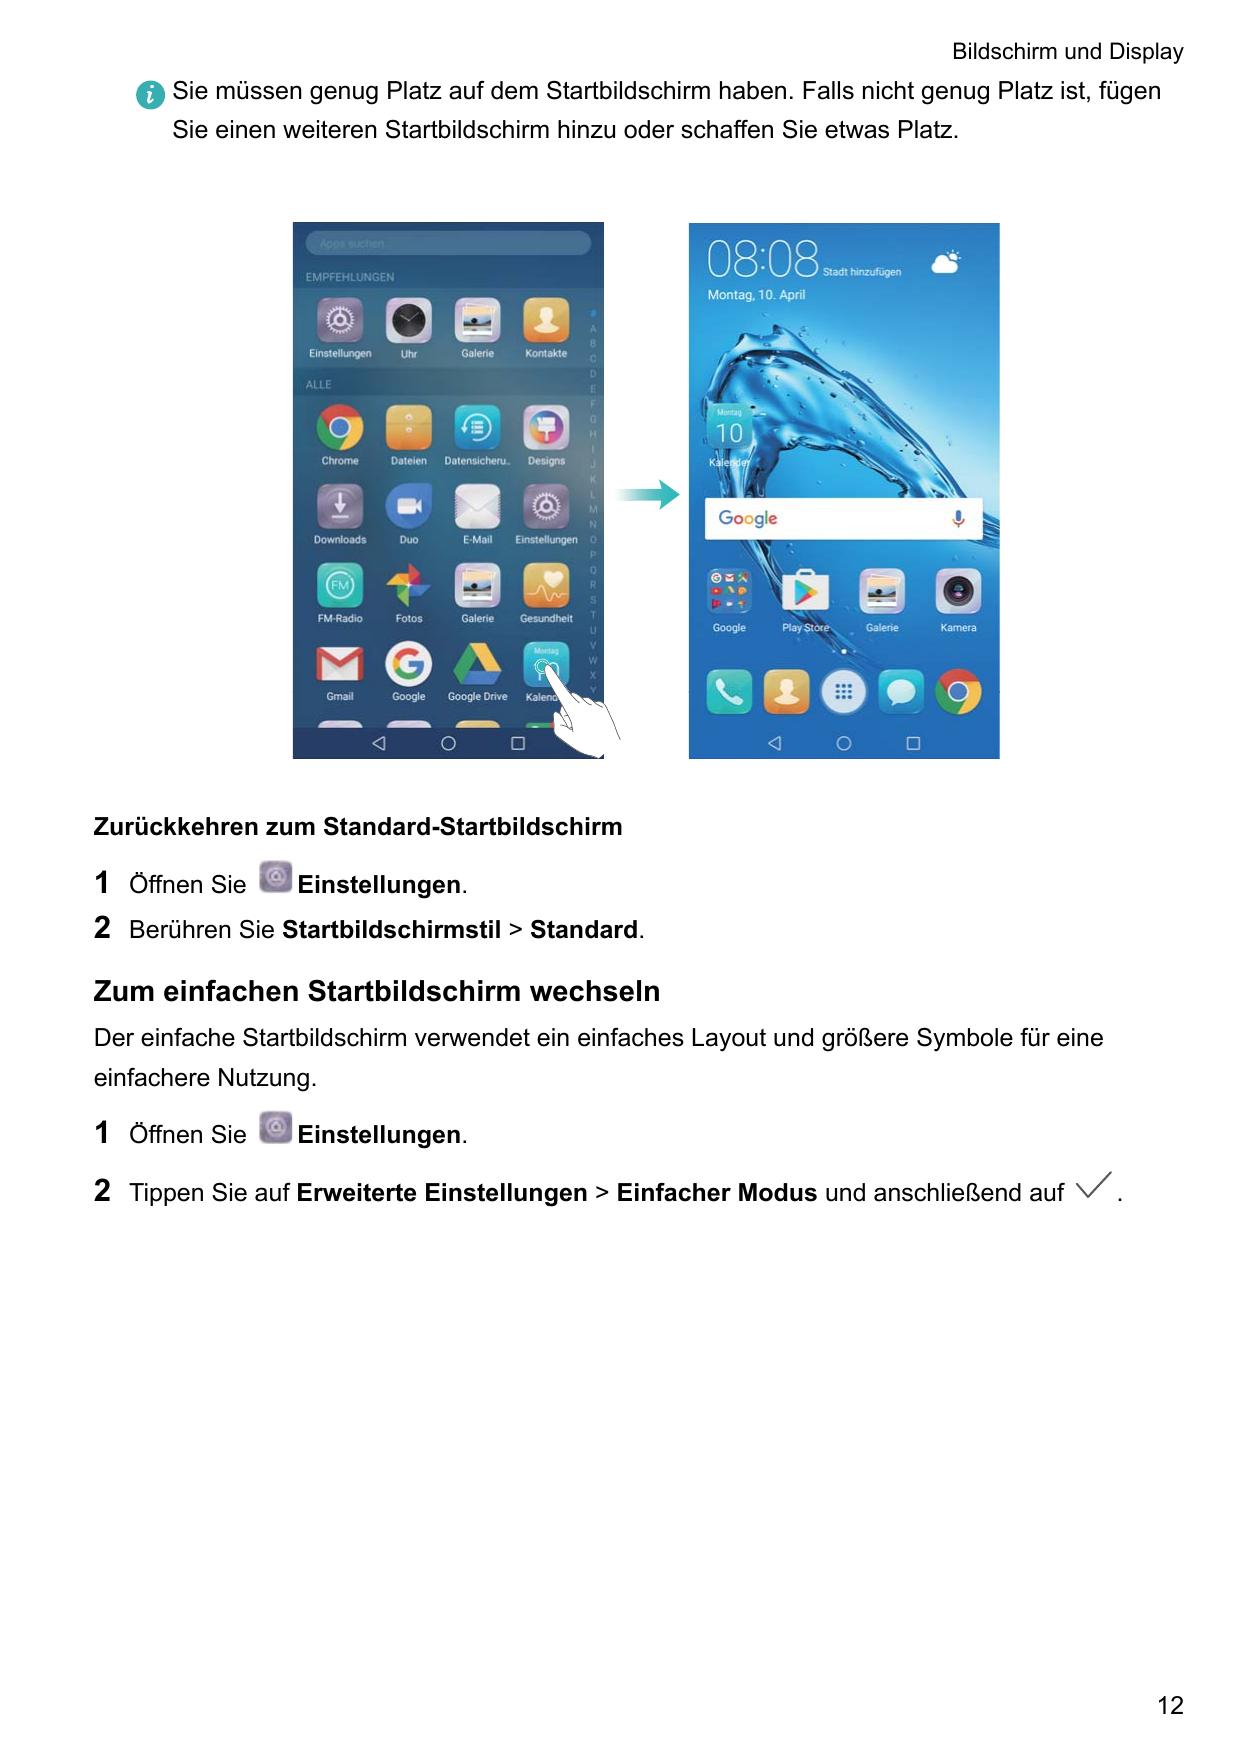 Bedienungsanleitung - Huawei Y7 - Android 7.0 - mobilcom-debitel Guides